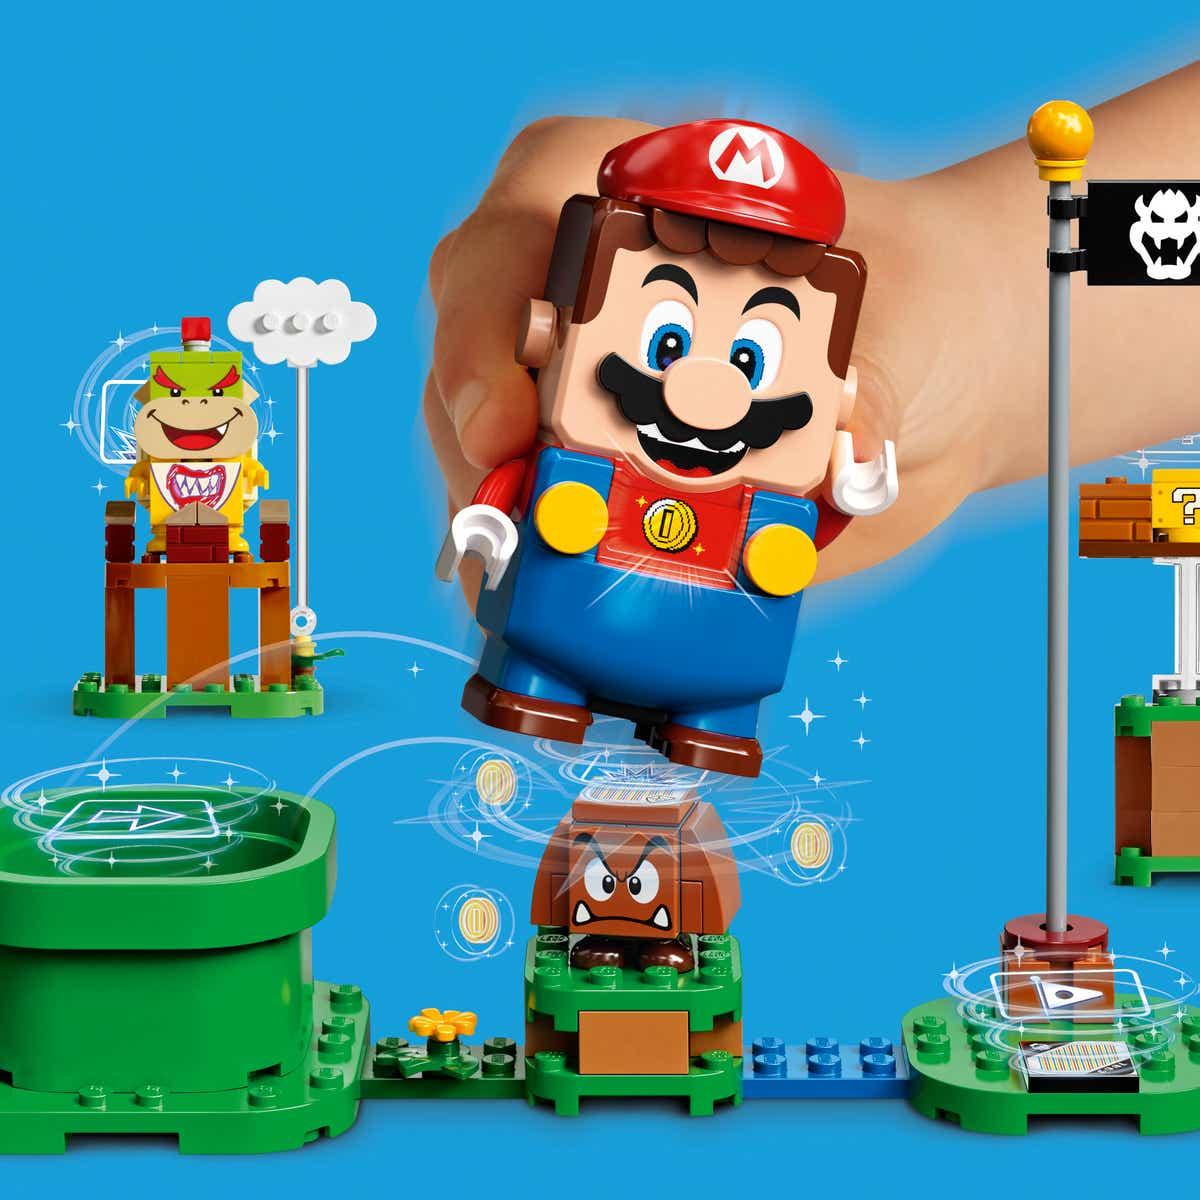 New Nintendo 2020 LEGO Mario Bluetooth set Pre-Order on Amazon.com $59.99